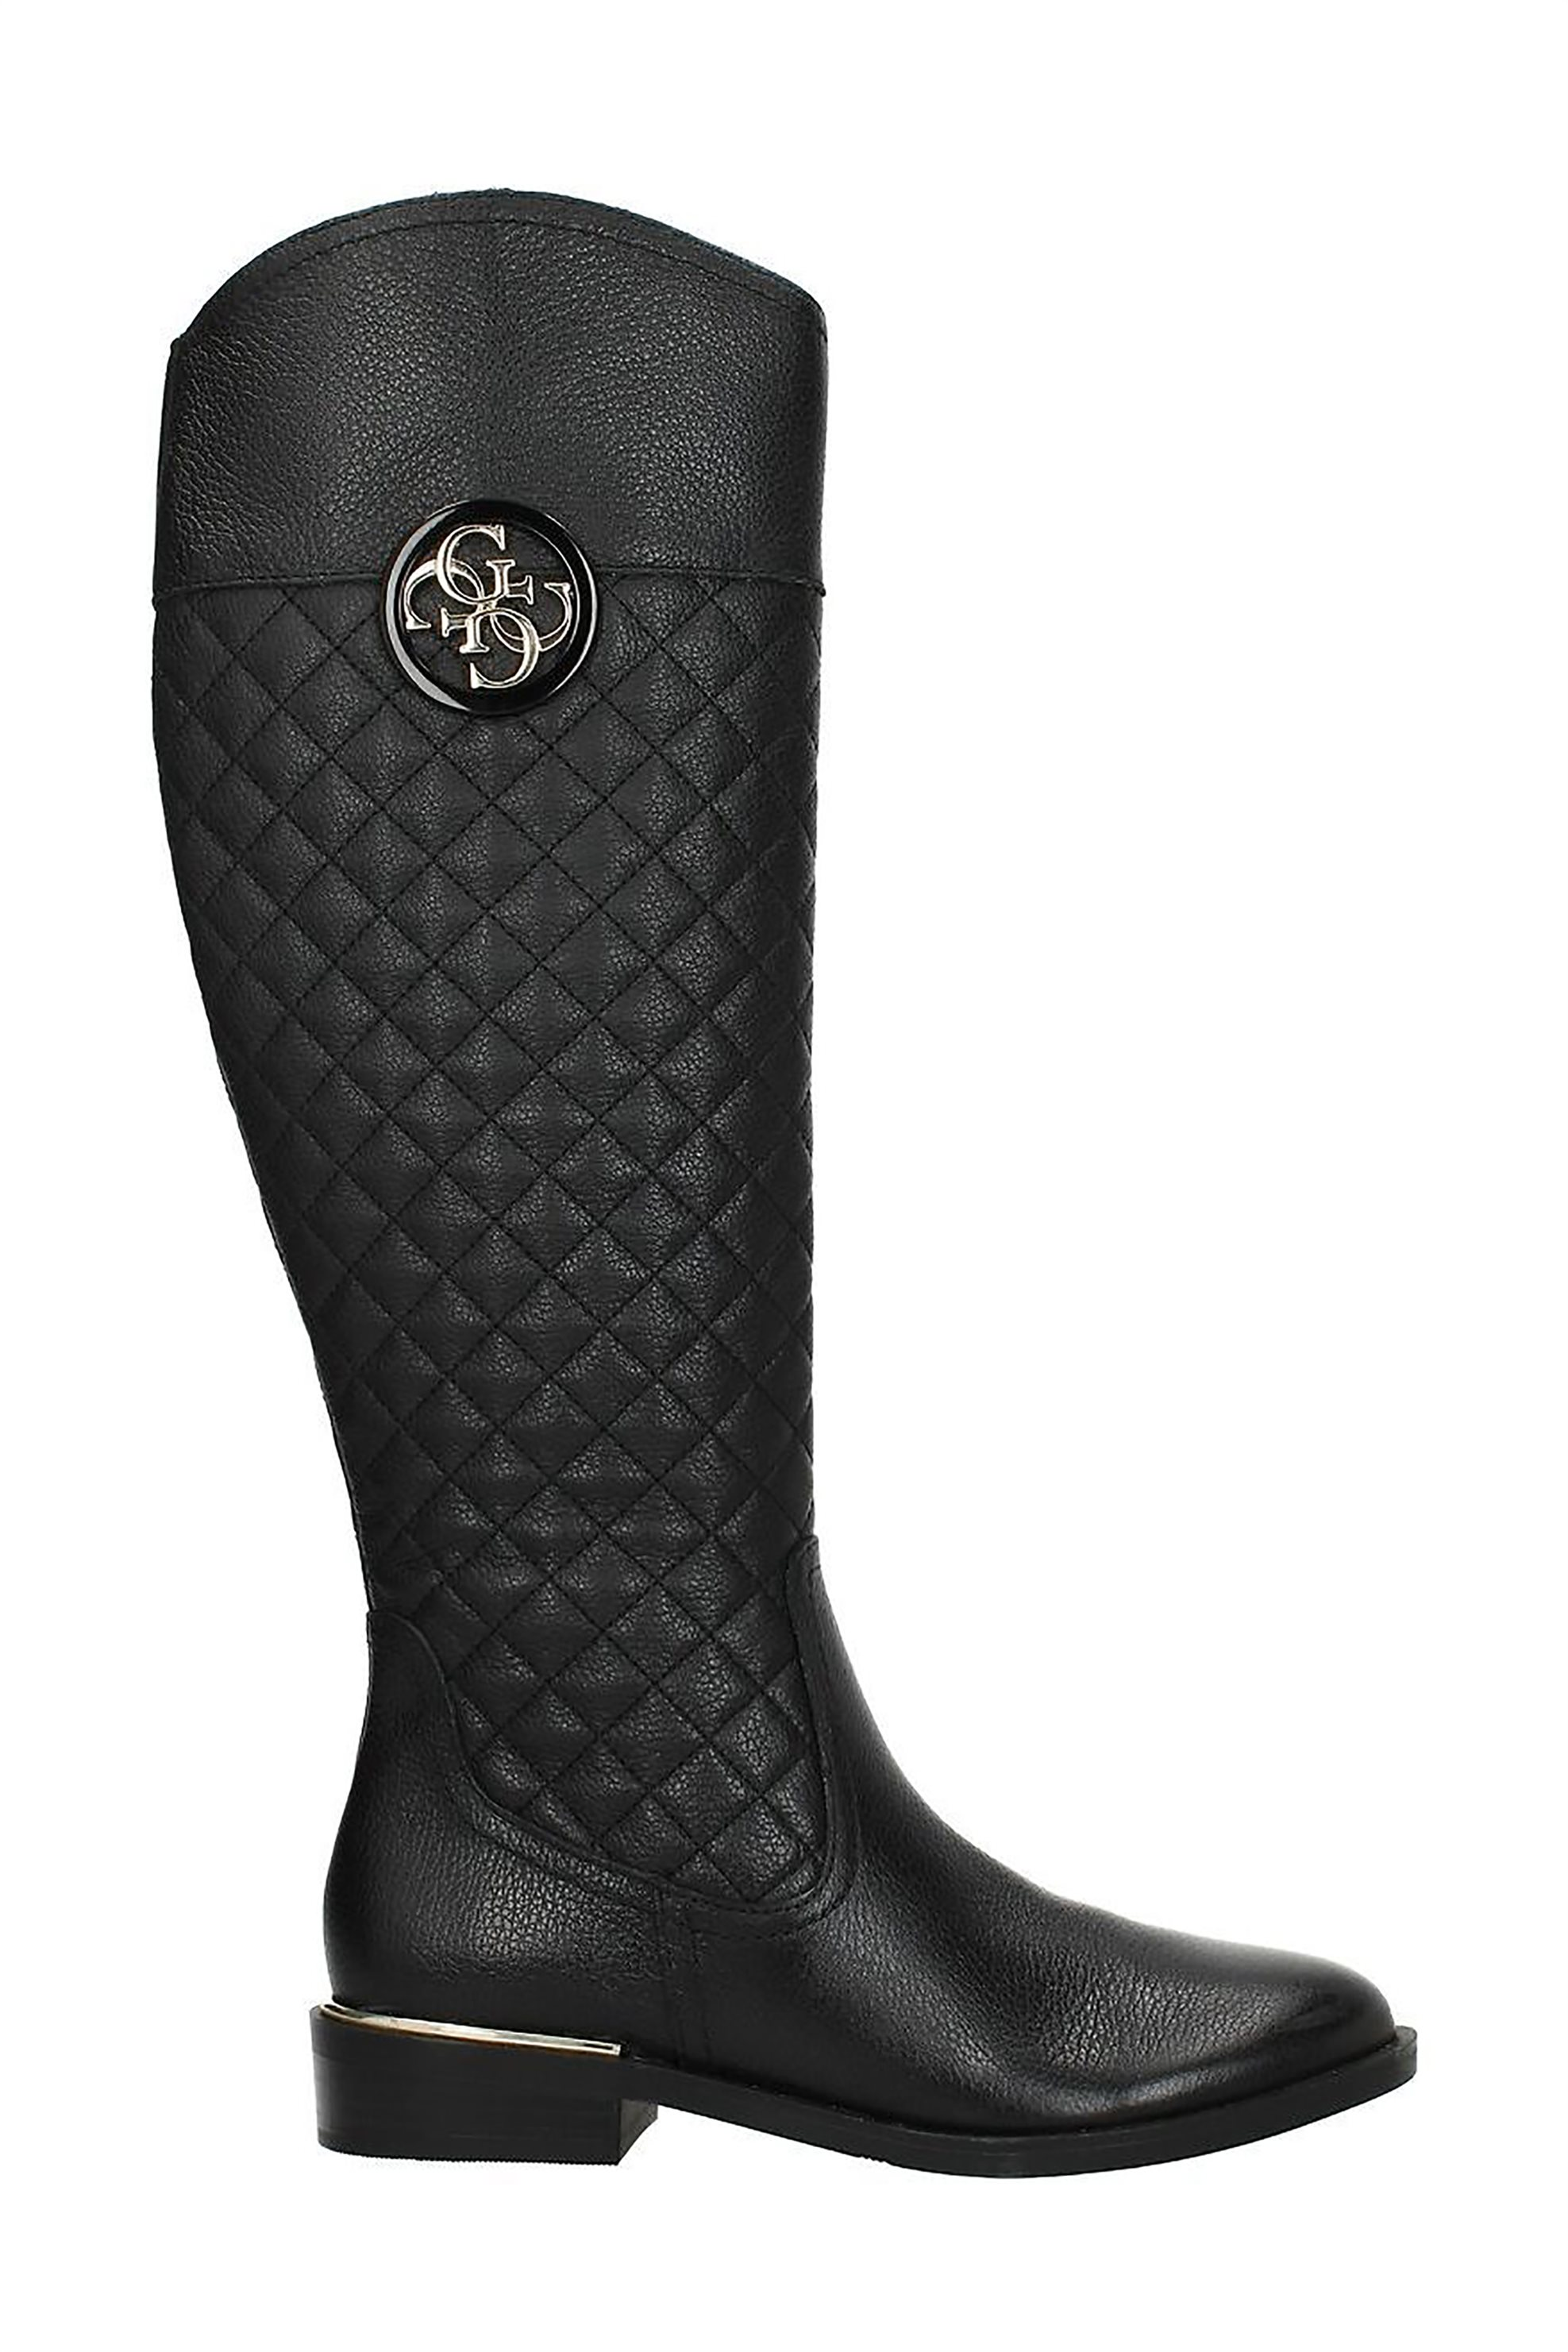 "Guess γυναικείες δερμάτινες μπότες με καπιτονέ σχέδιο ""Dabrela"" – FL8DABLEA11 – Μαυρο"